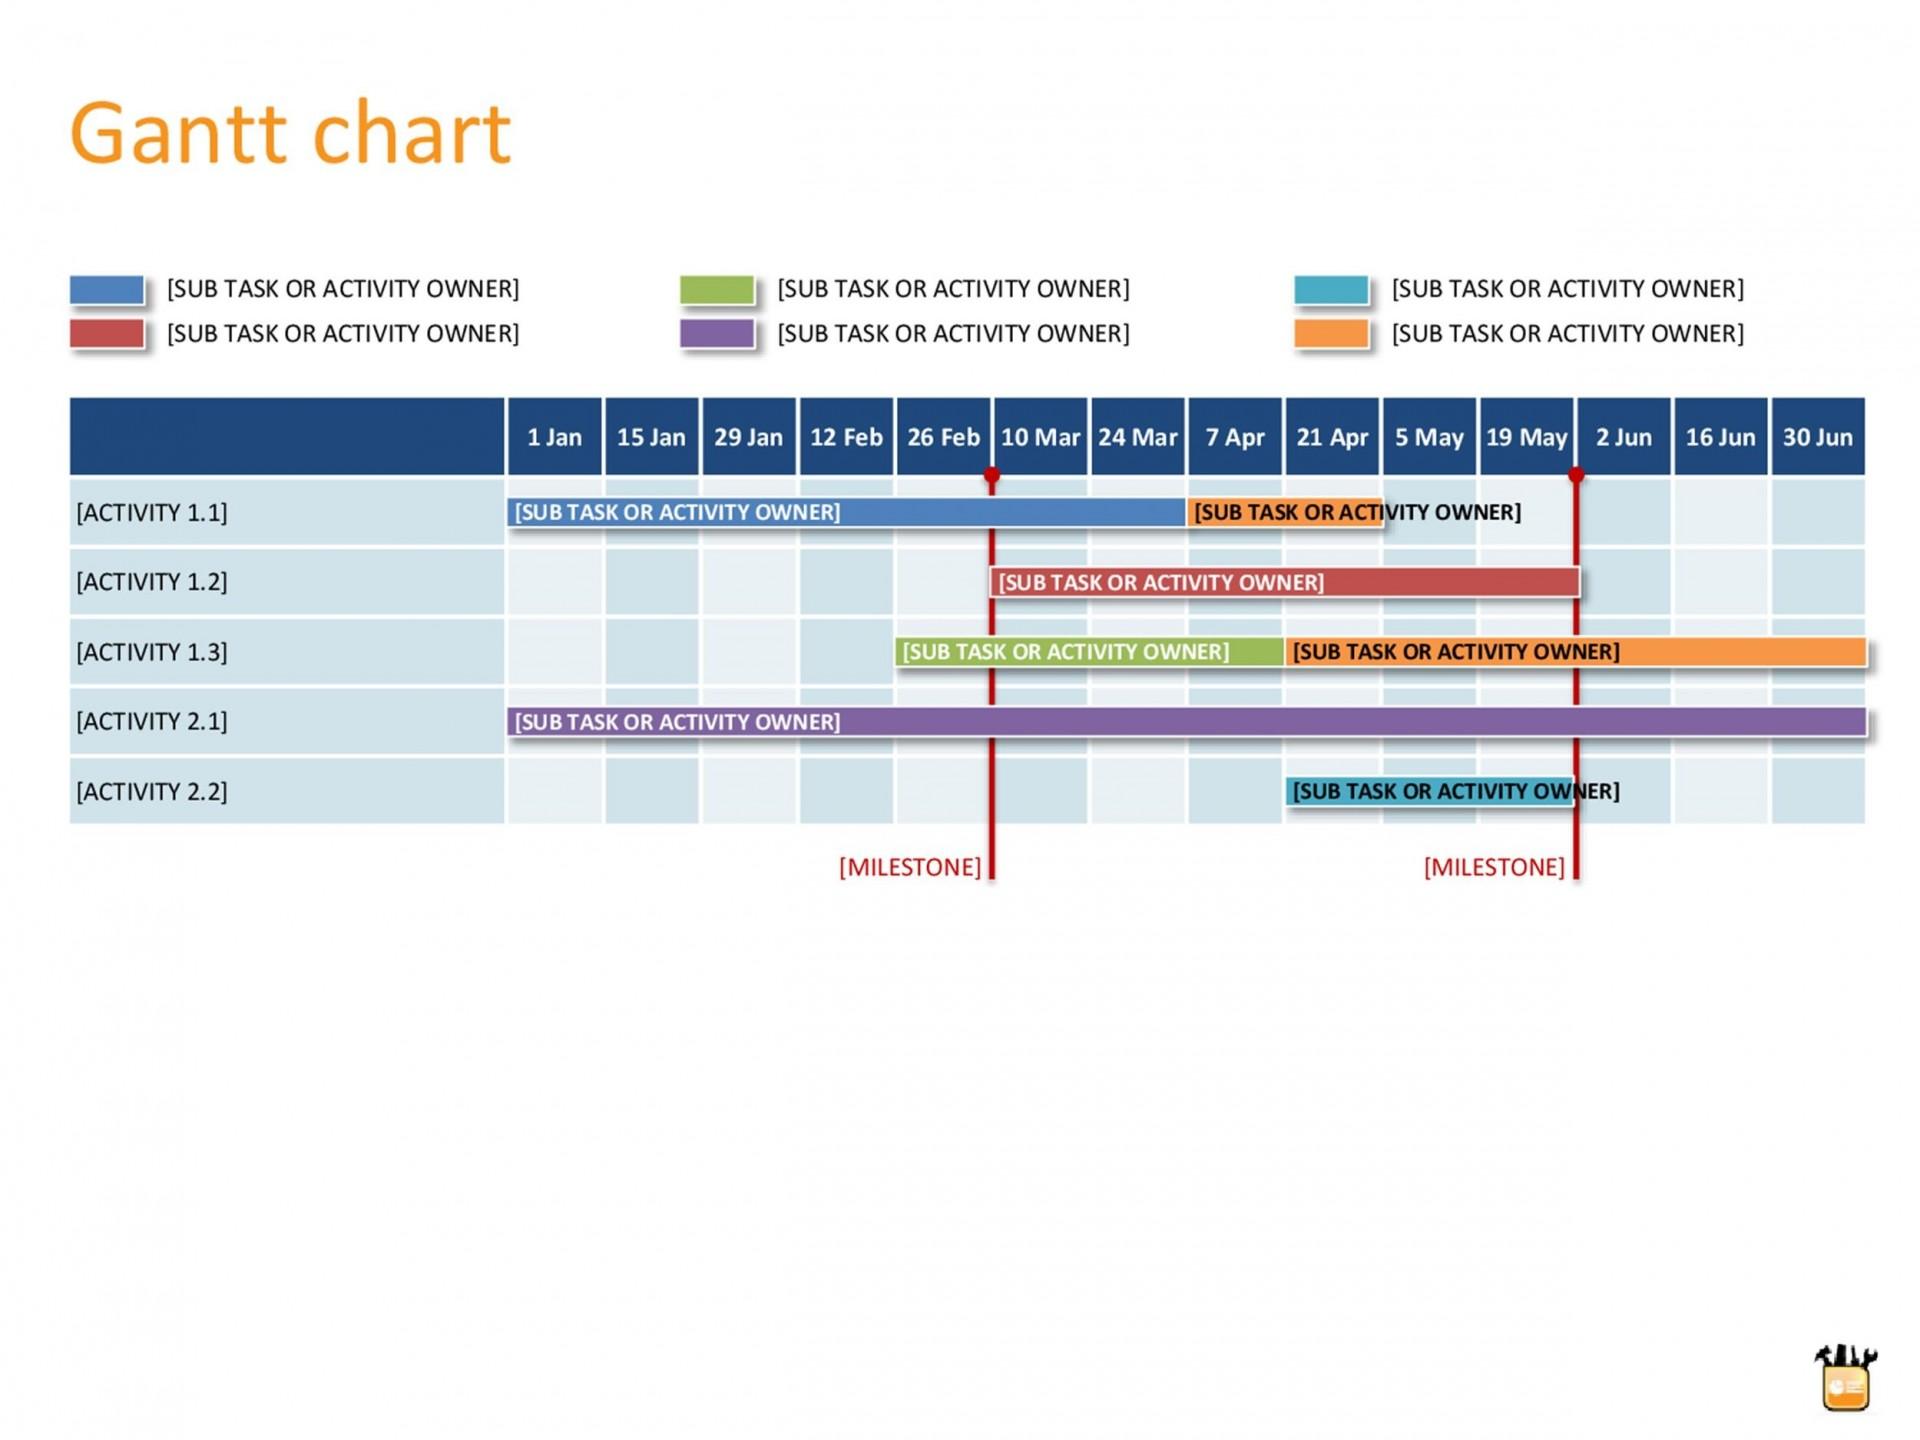 007 Unusual Free Gantt Chart Template Excel Idea  2017 Dynamic Download1920